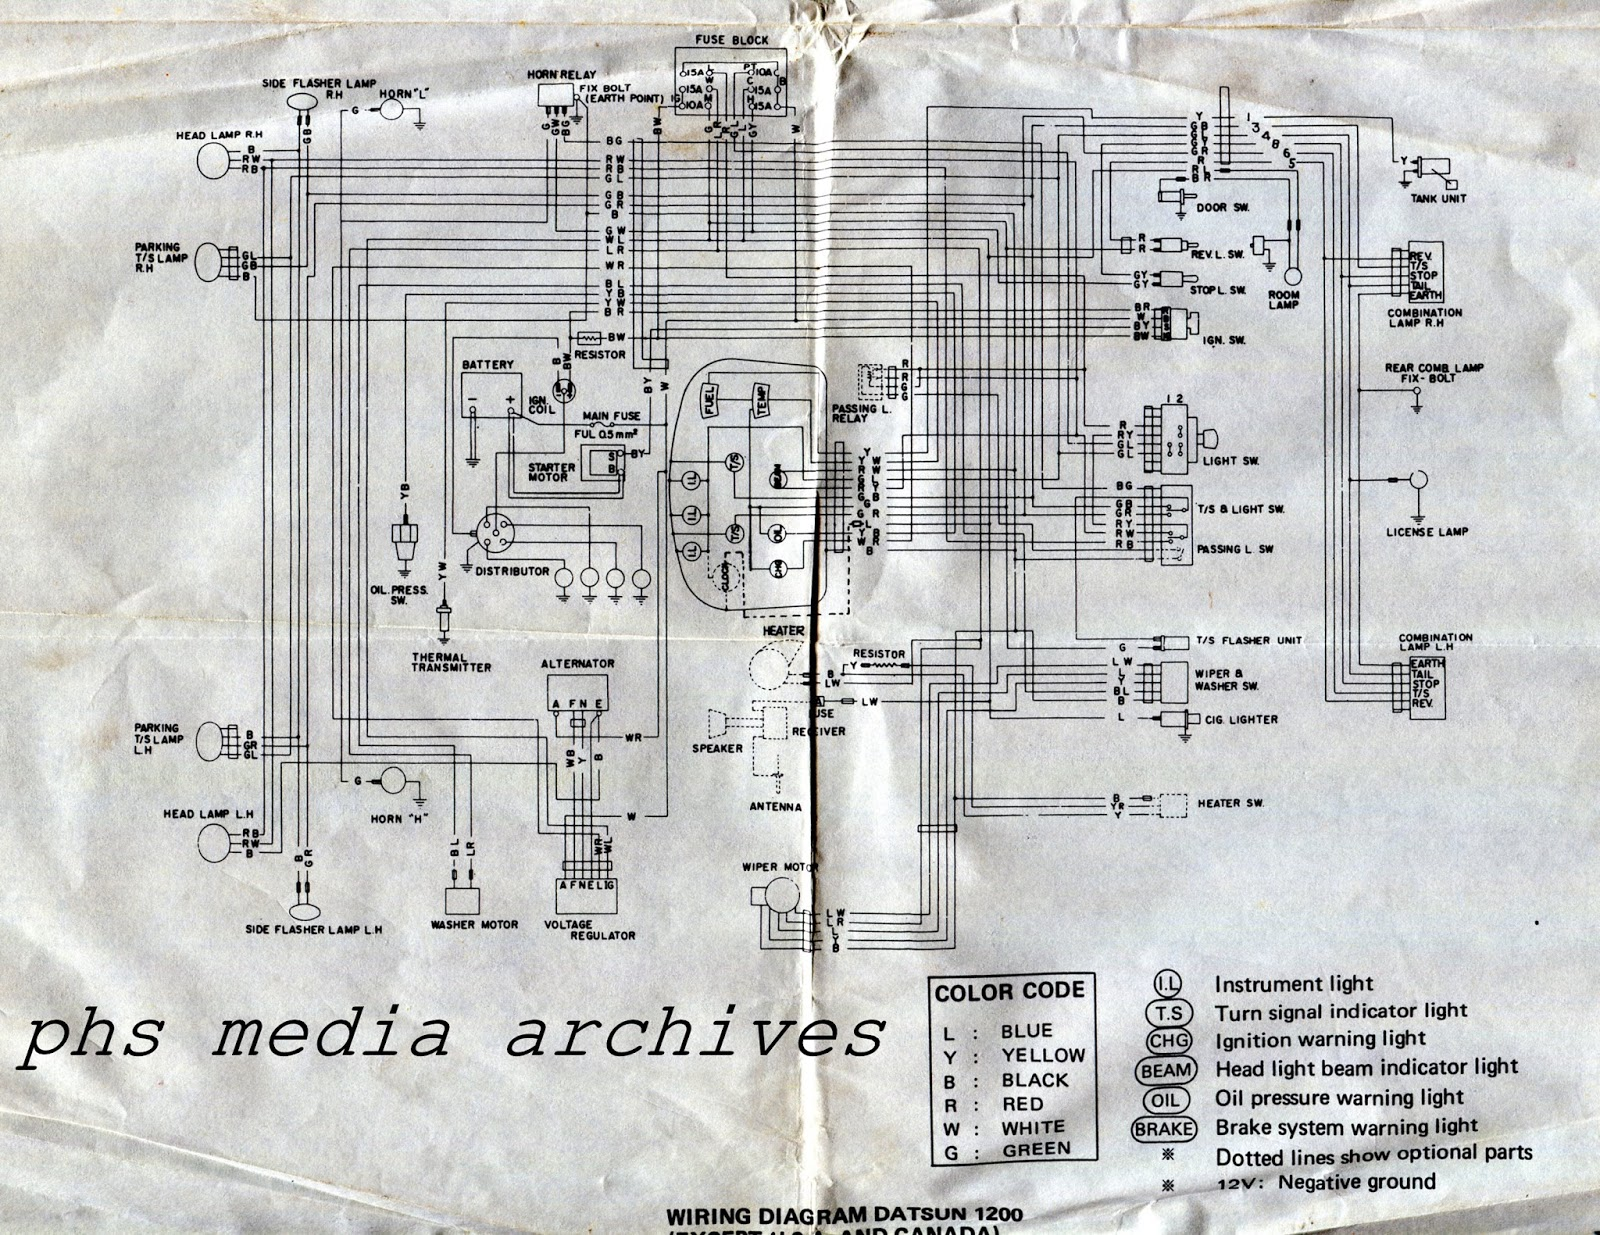 medium resolution of phs tech series 1971 72 datsun 1200 wiring diagrams 3 way switch light wiring diagram